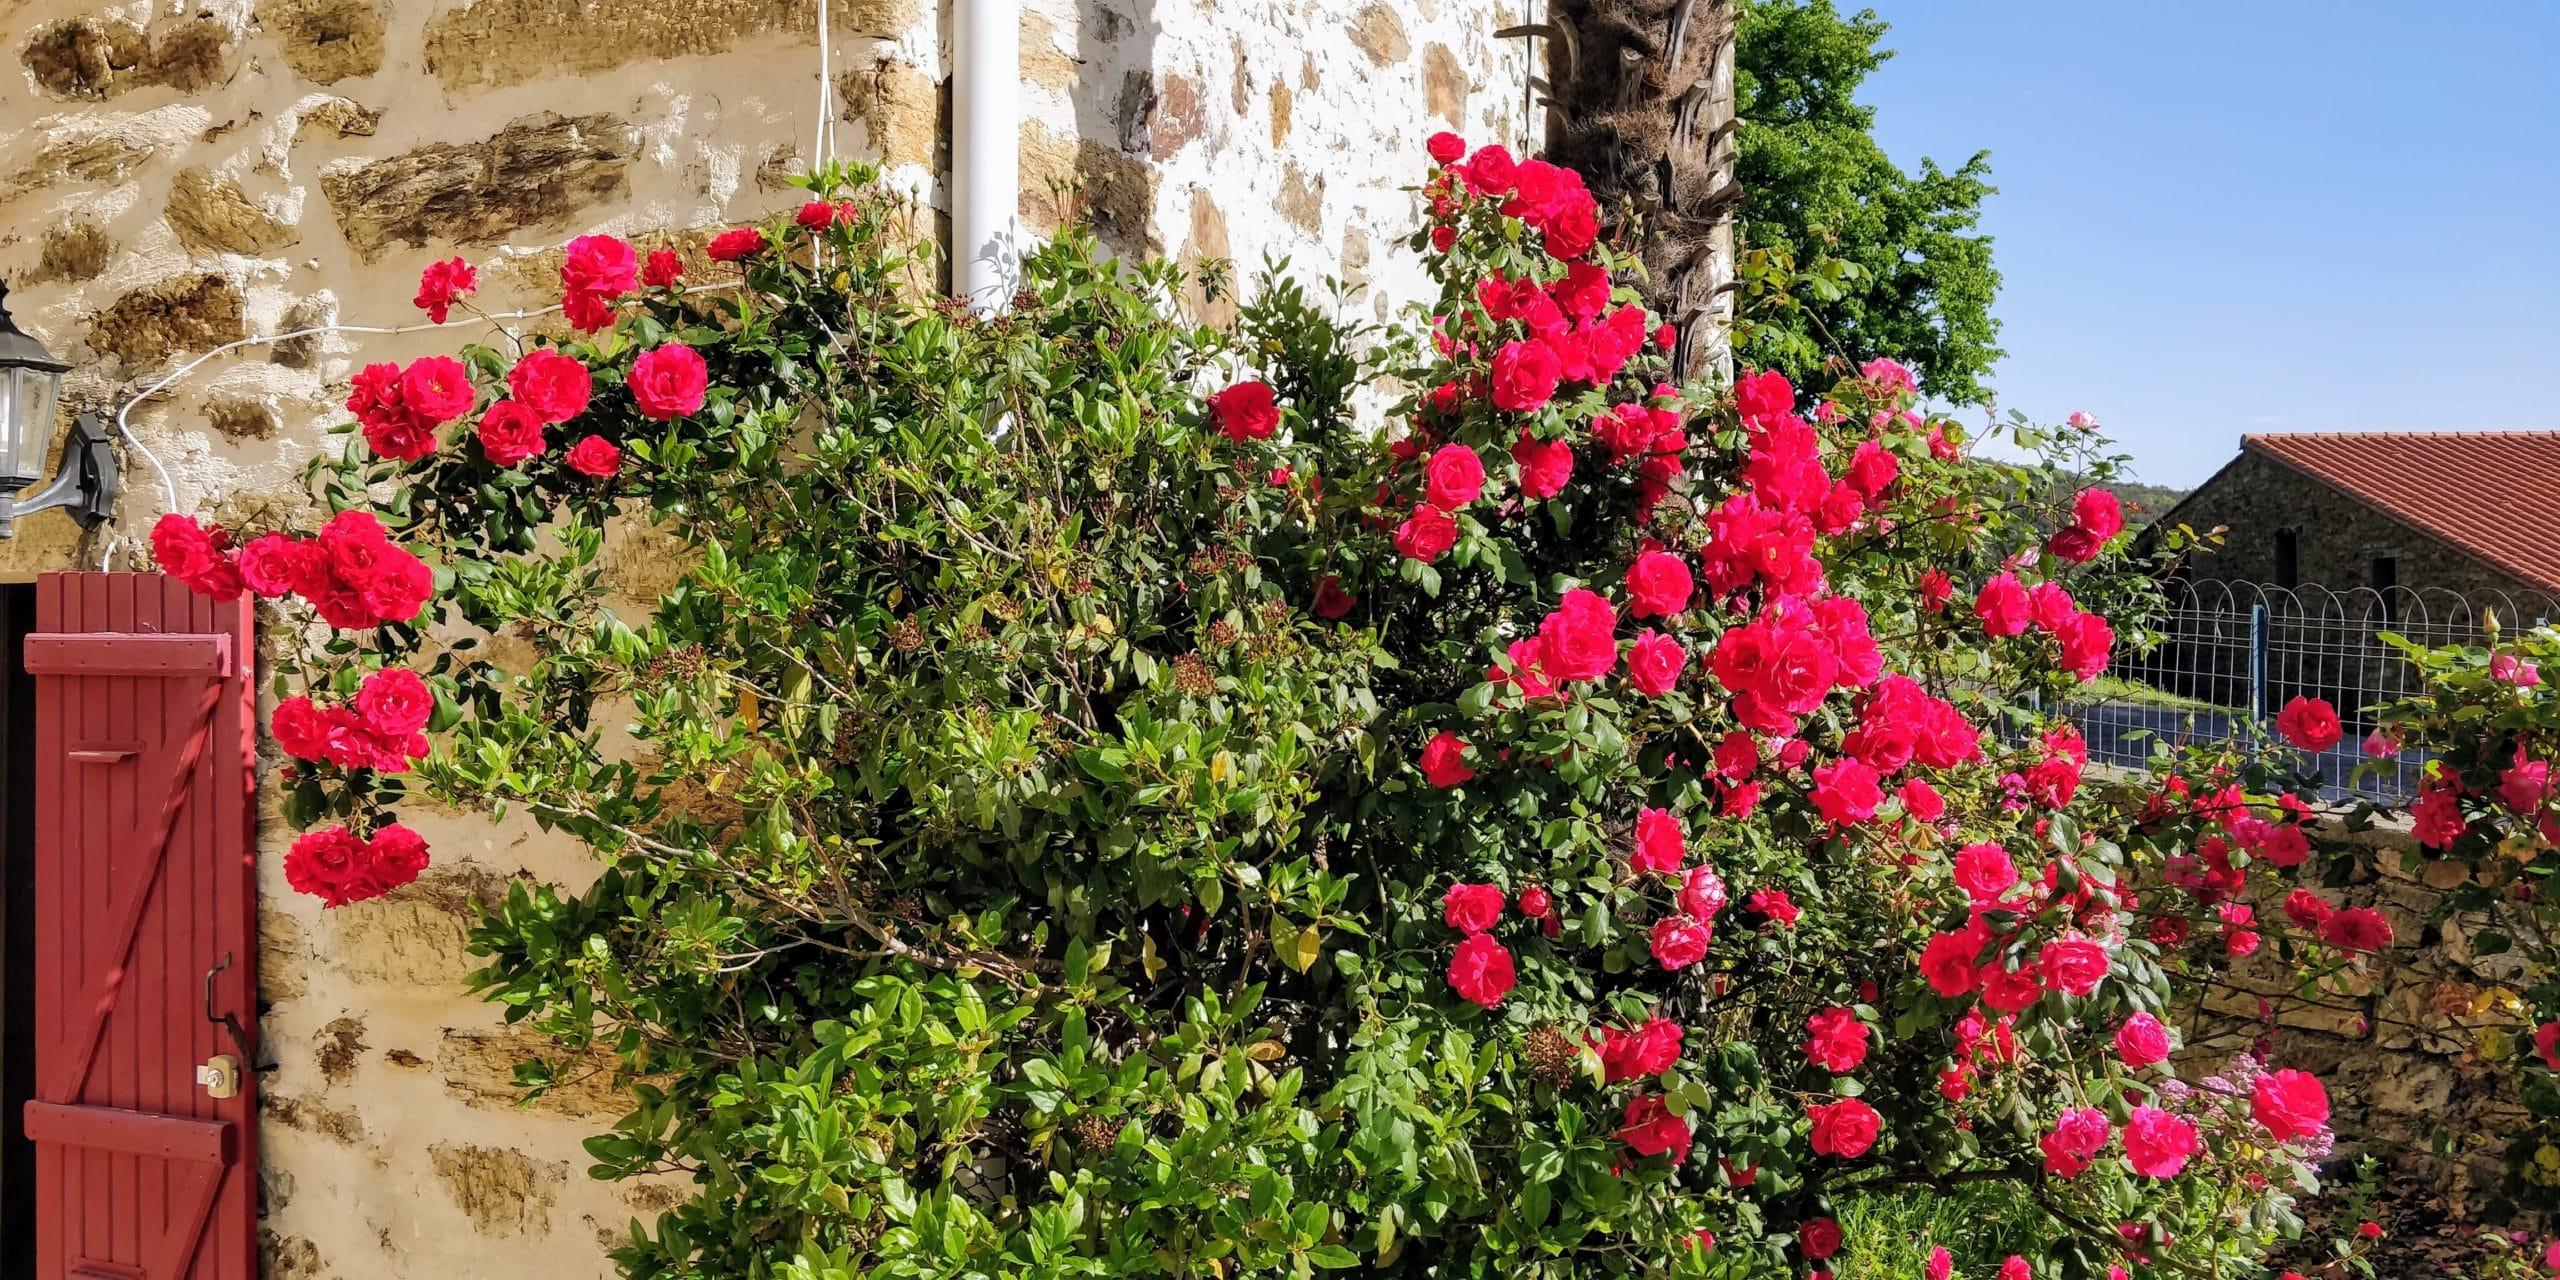 Les roses de la terrasse